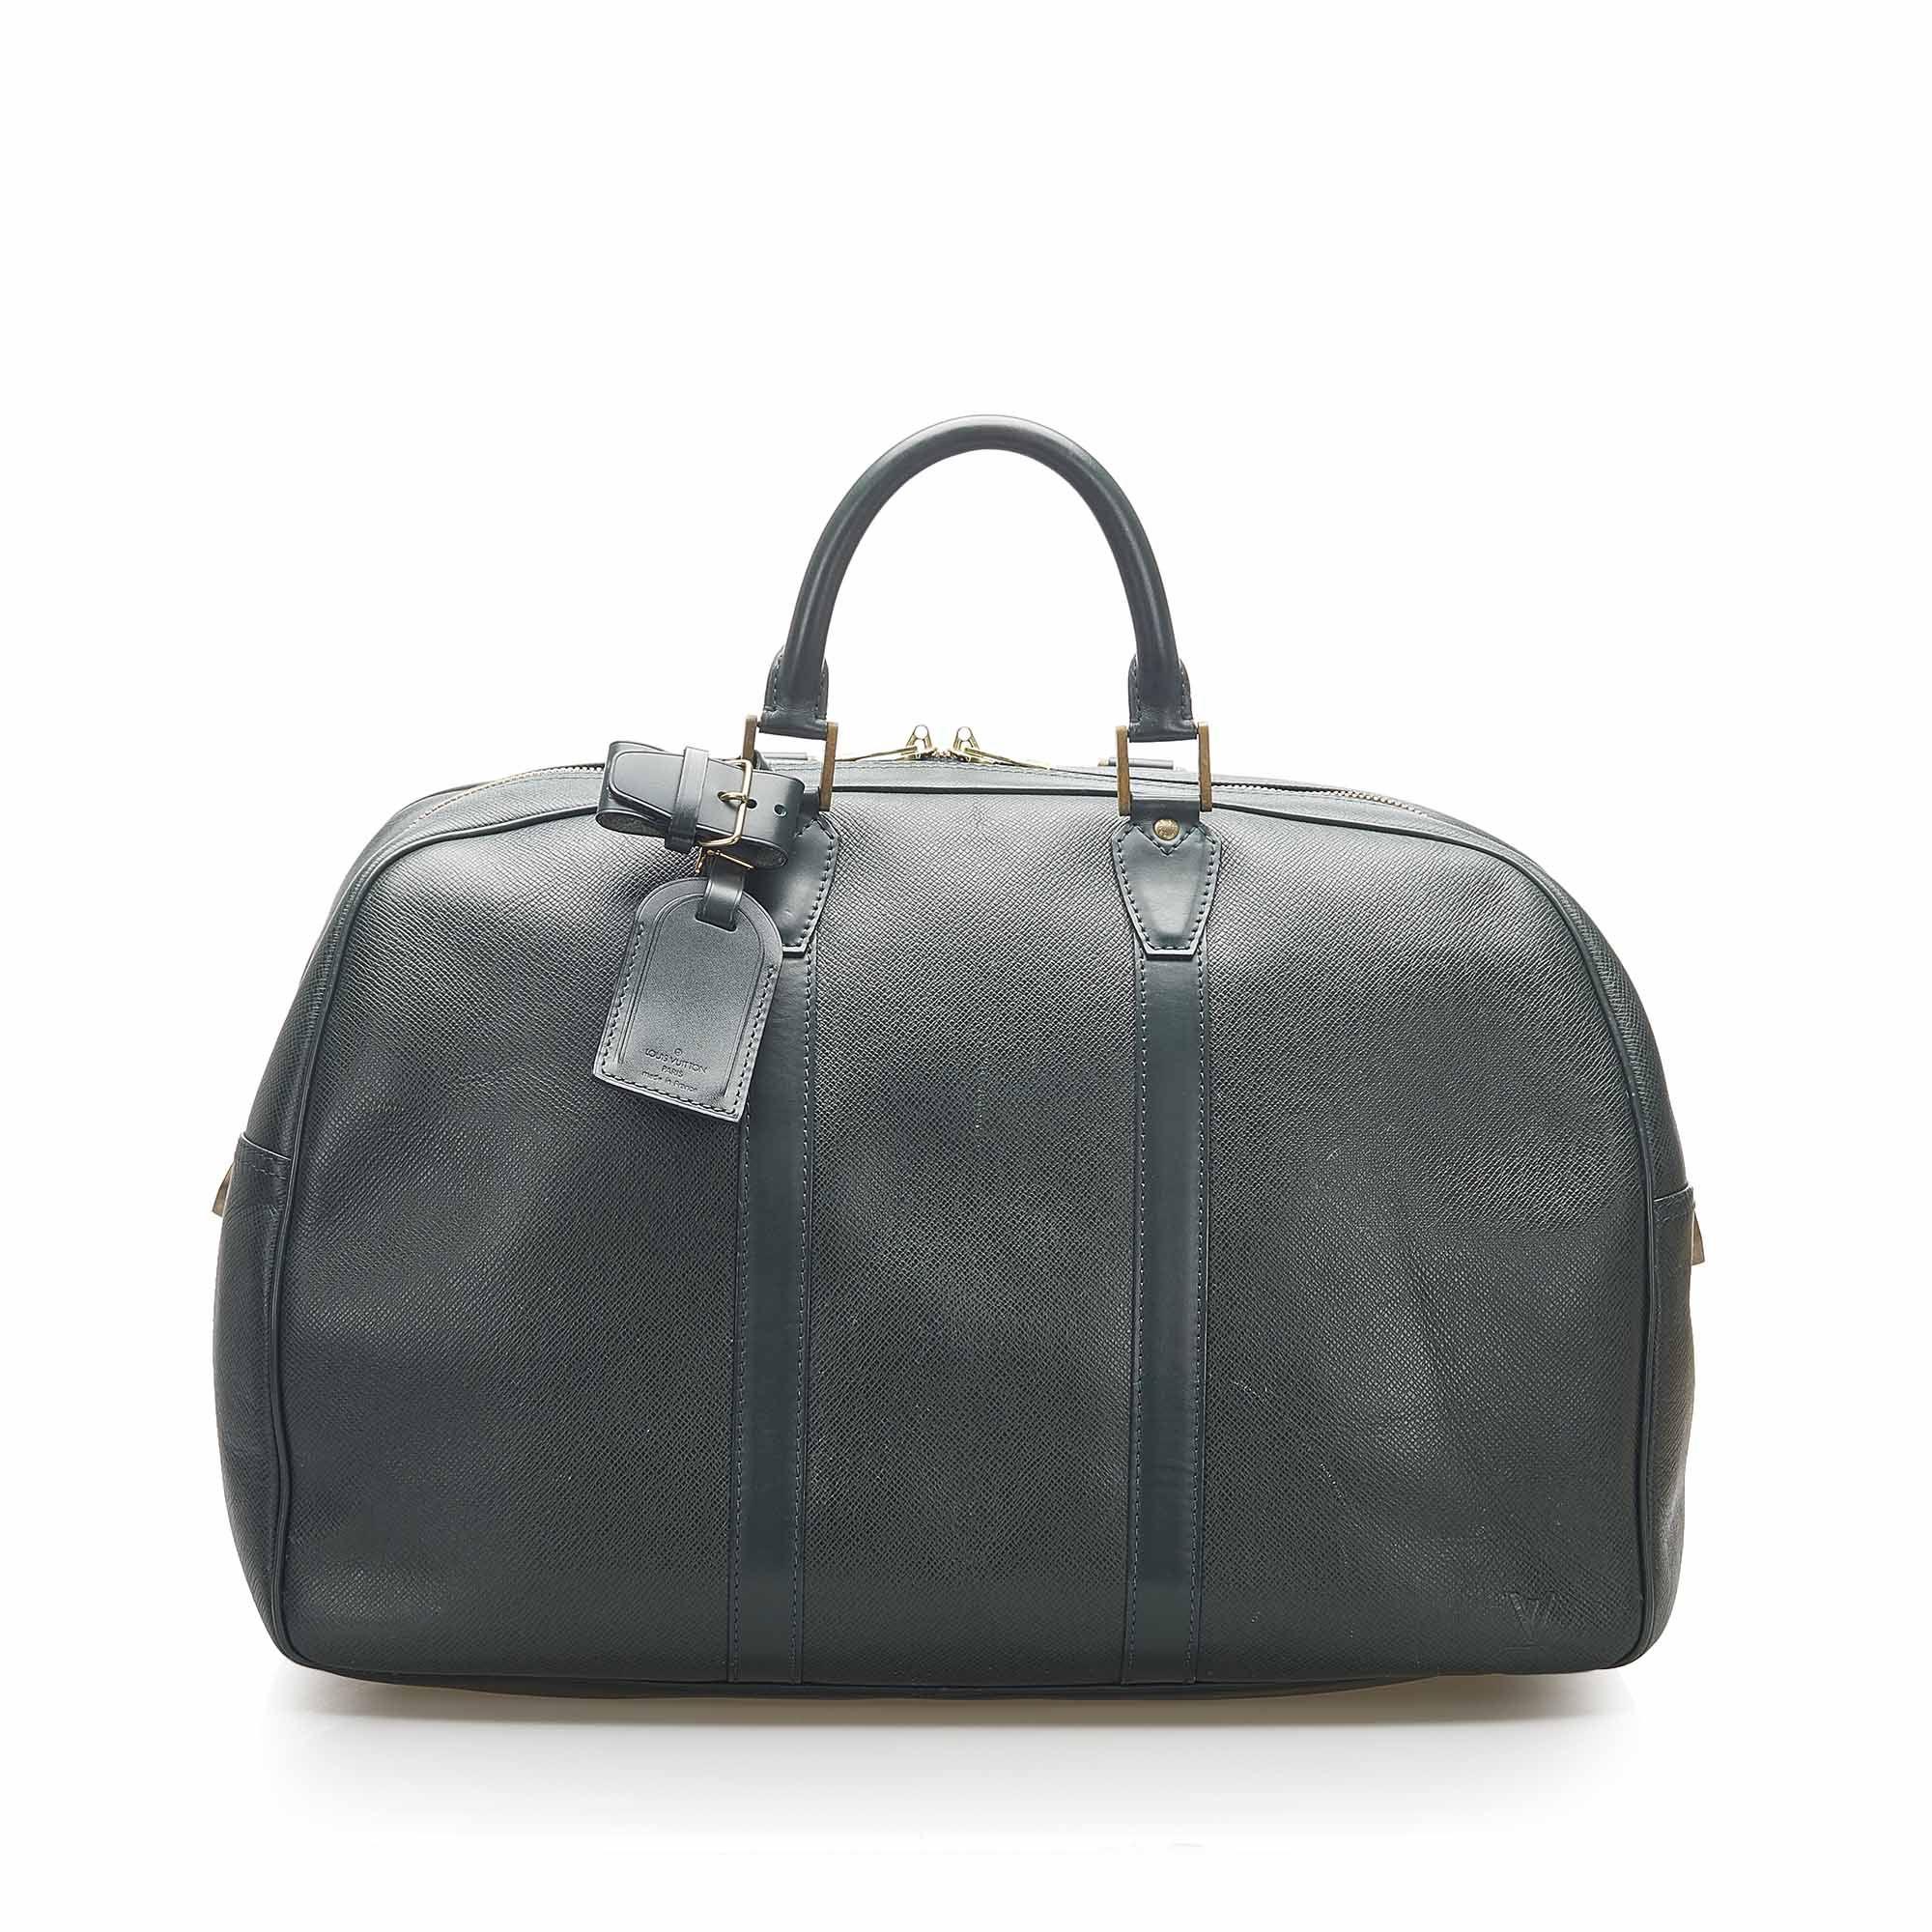 Vintage Louis Vuitton Taiga Kendall PM Green